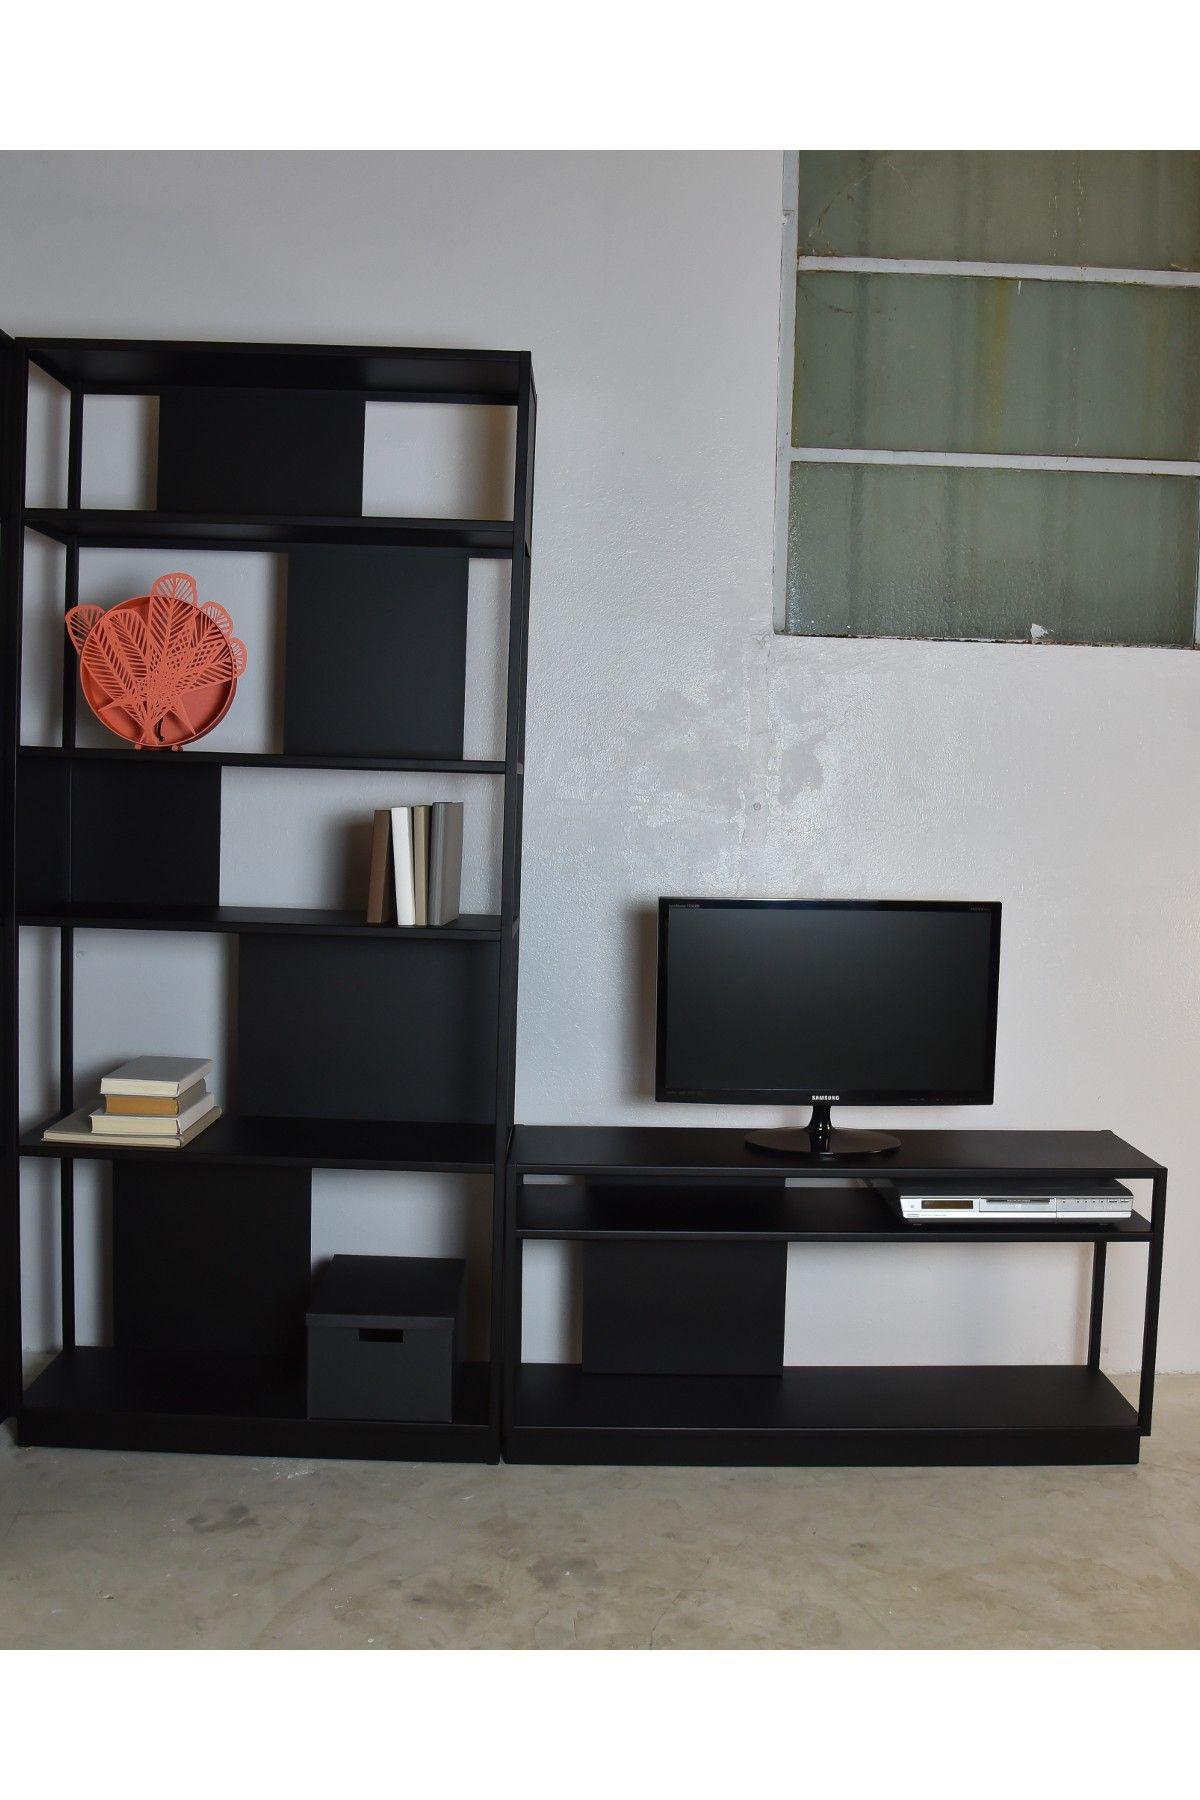 Meuble Tv Metal Design Noir Arlequin Home Decor Decor Shelving Unit